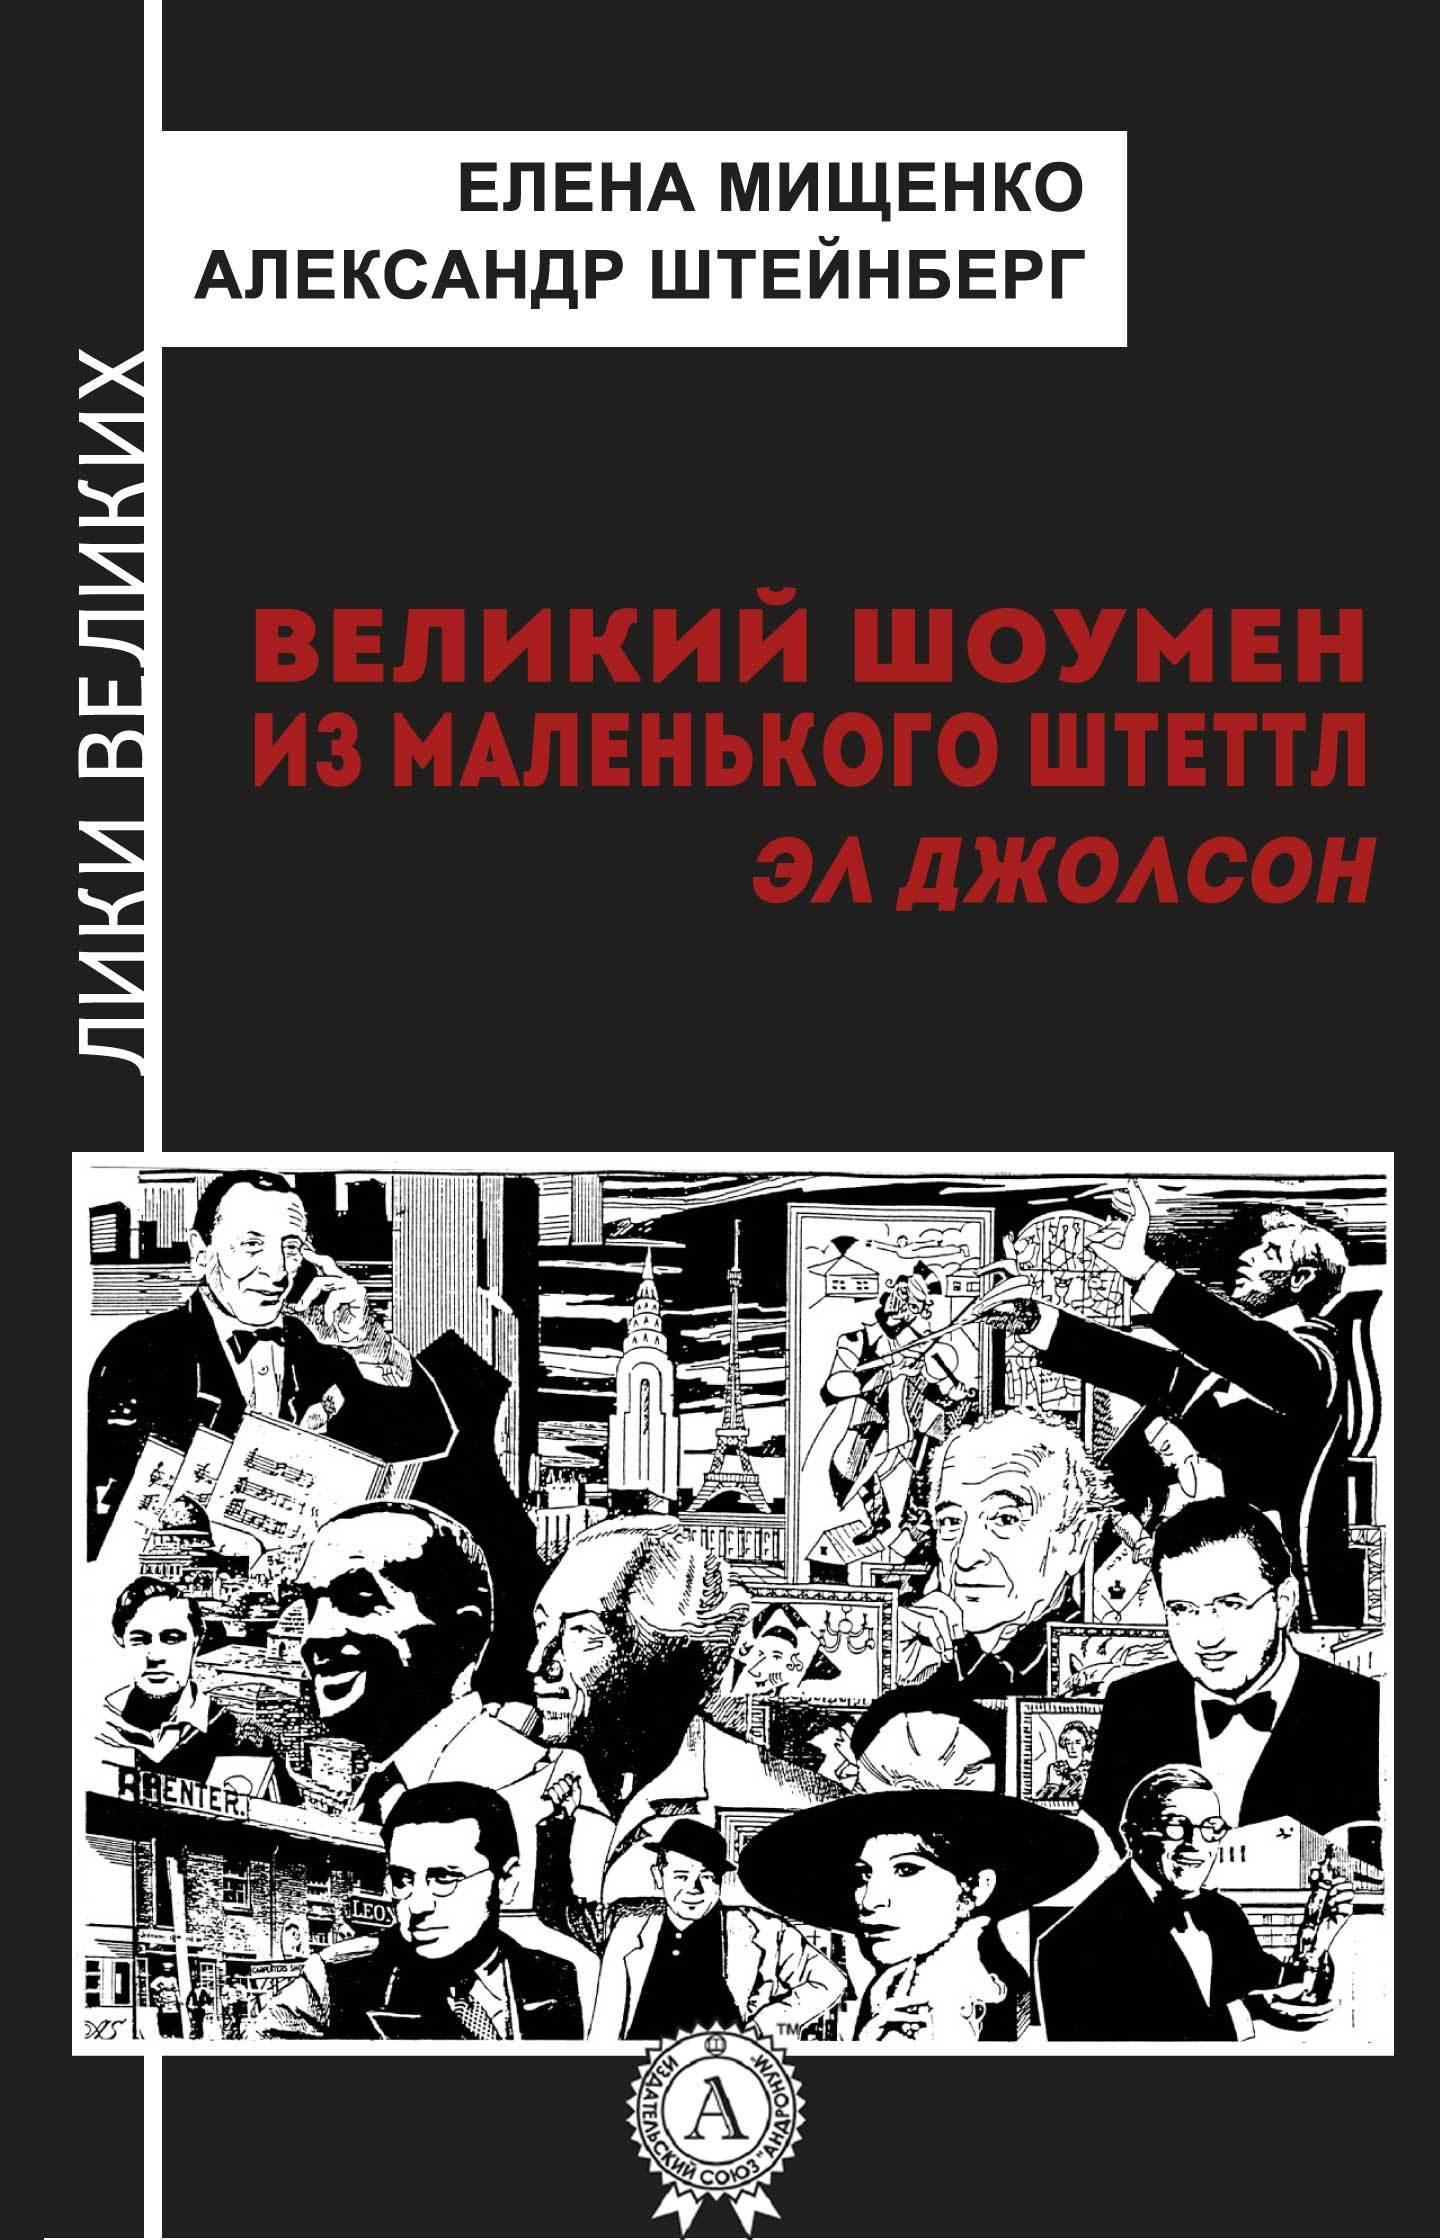 интригующее повествование в книге Елена Мищенко